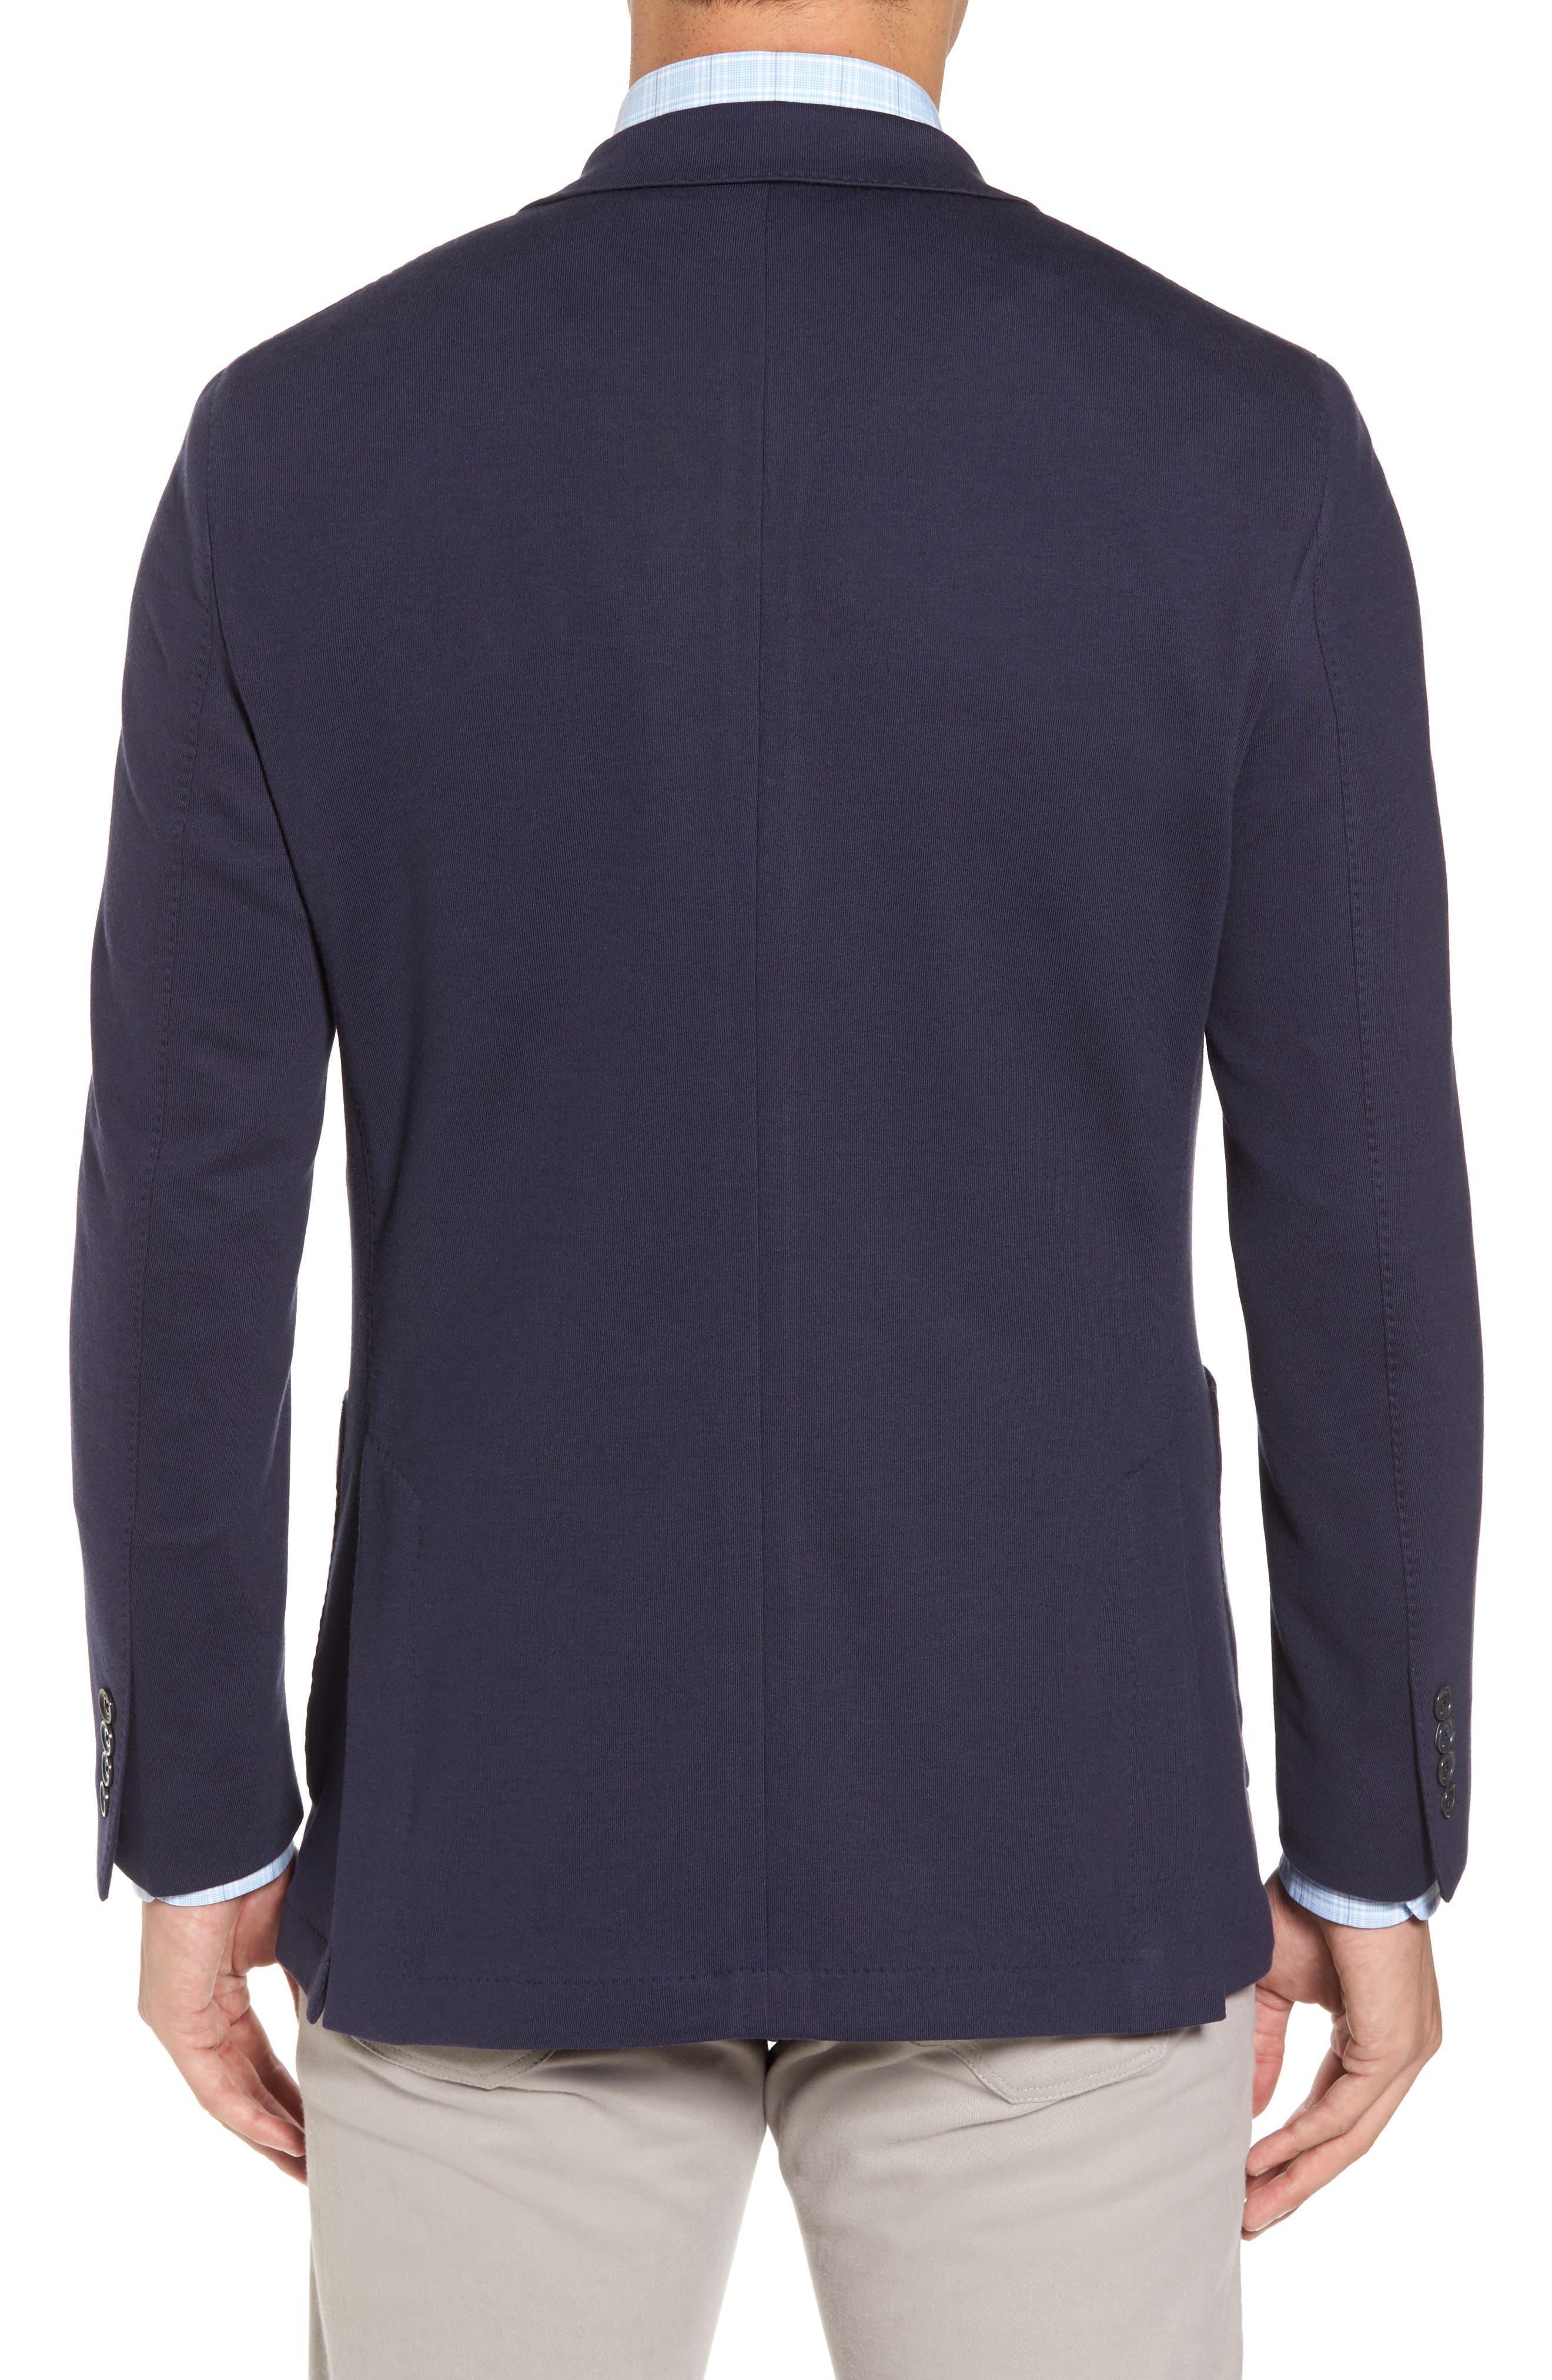 Santorini Jersey Knit Jacket,                             Alternate thumbnail 2, color,                             417